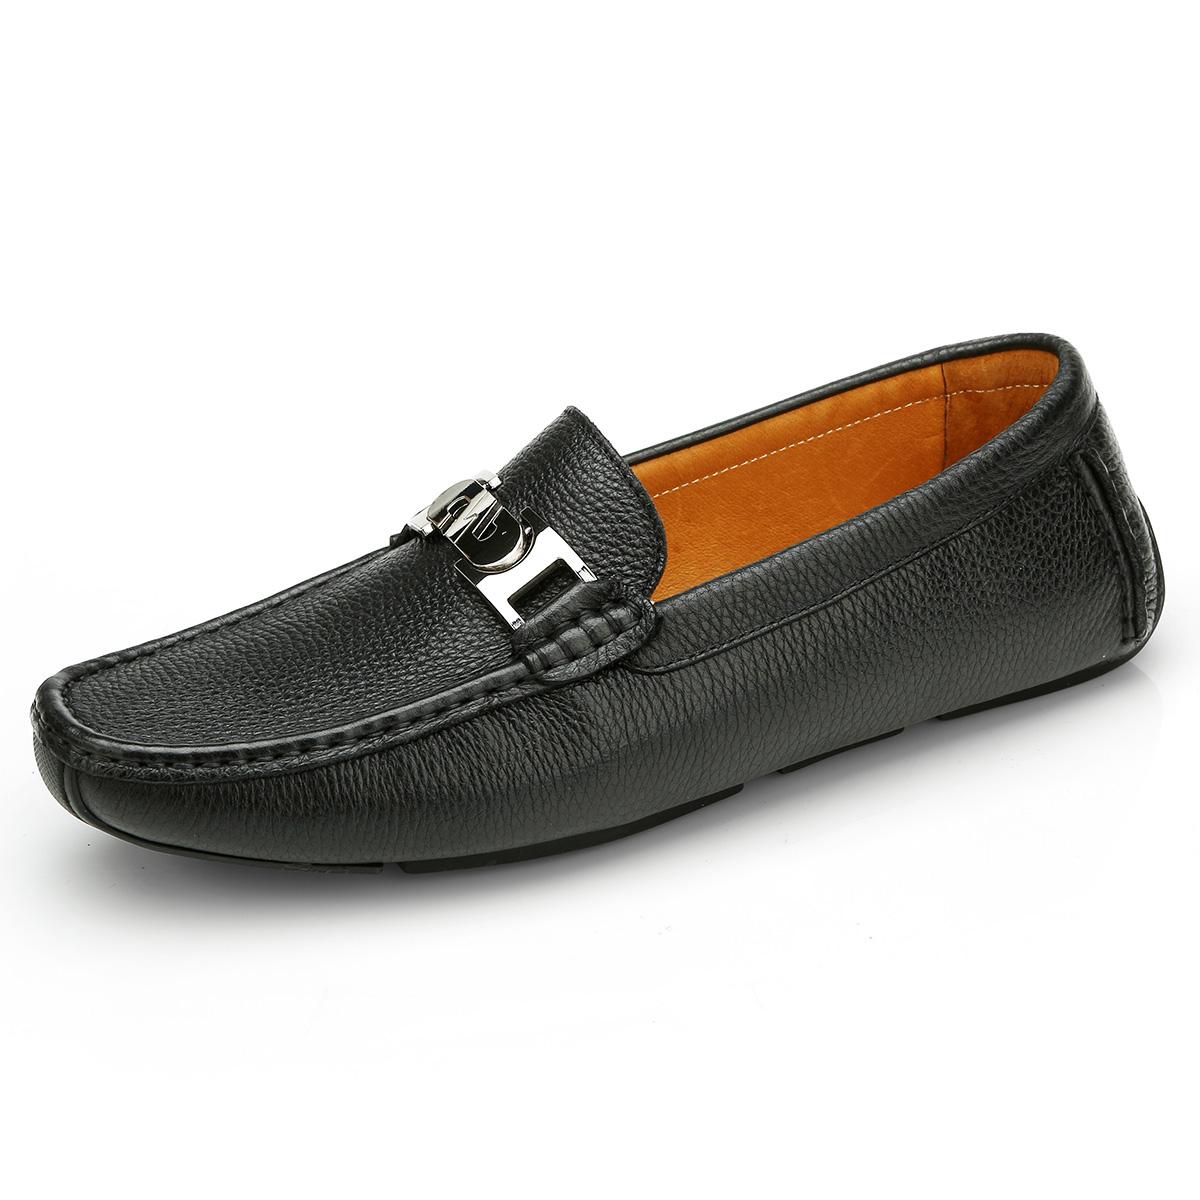 Giày lười chữ hợp kim Olunpo